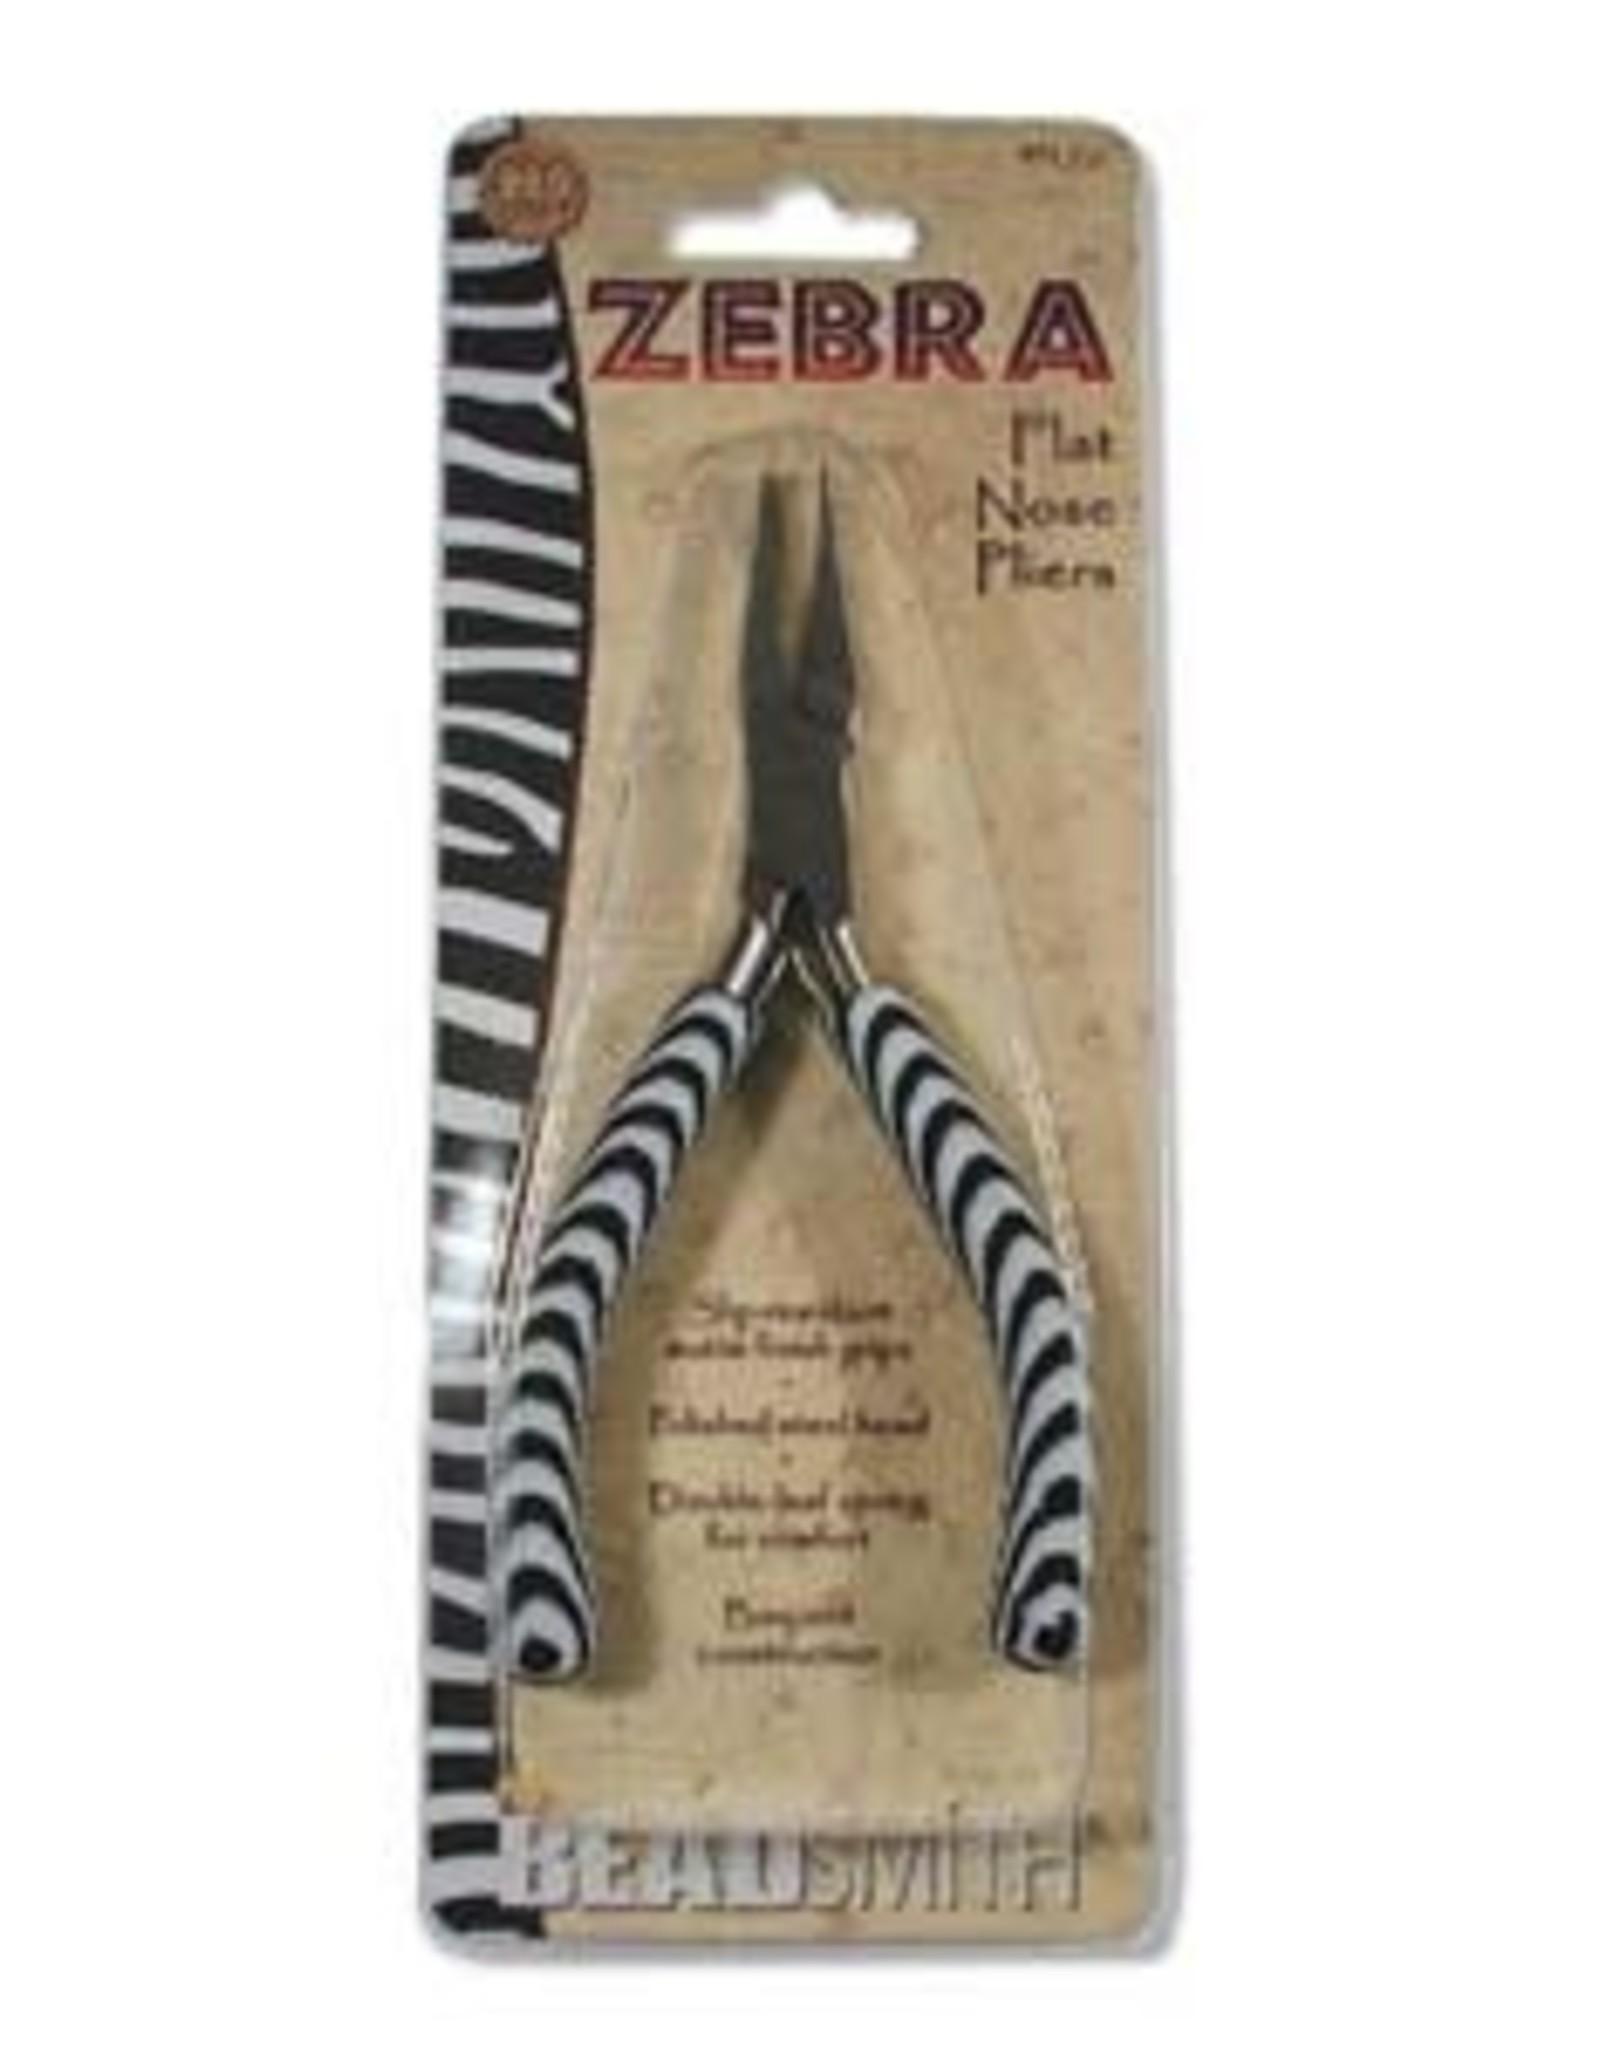 Zebra Flat Nose Pliers